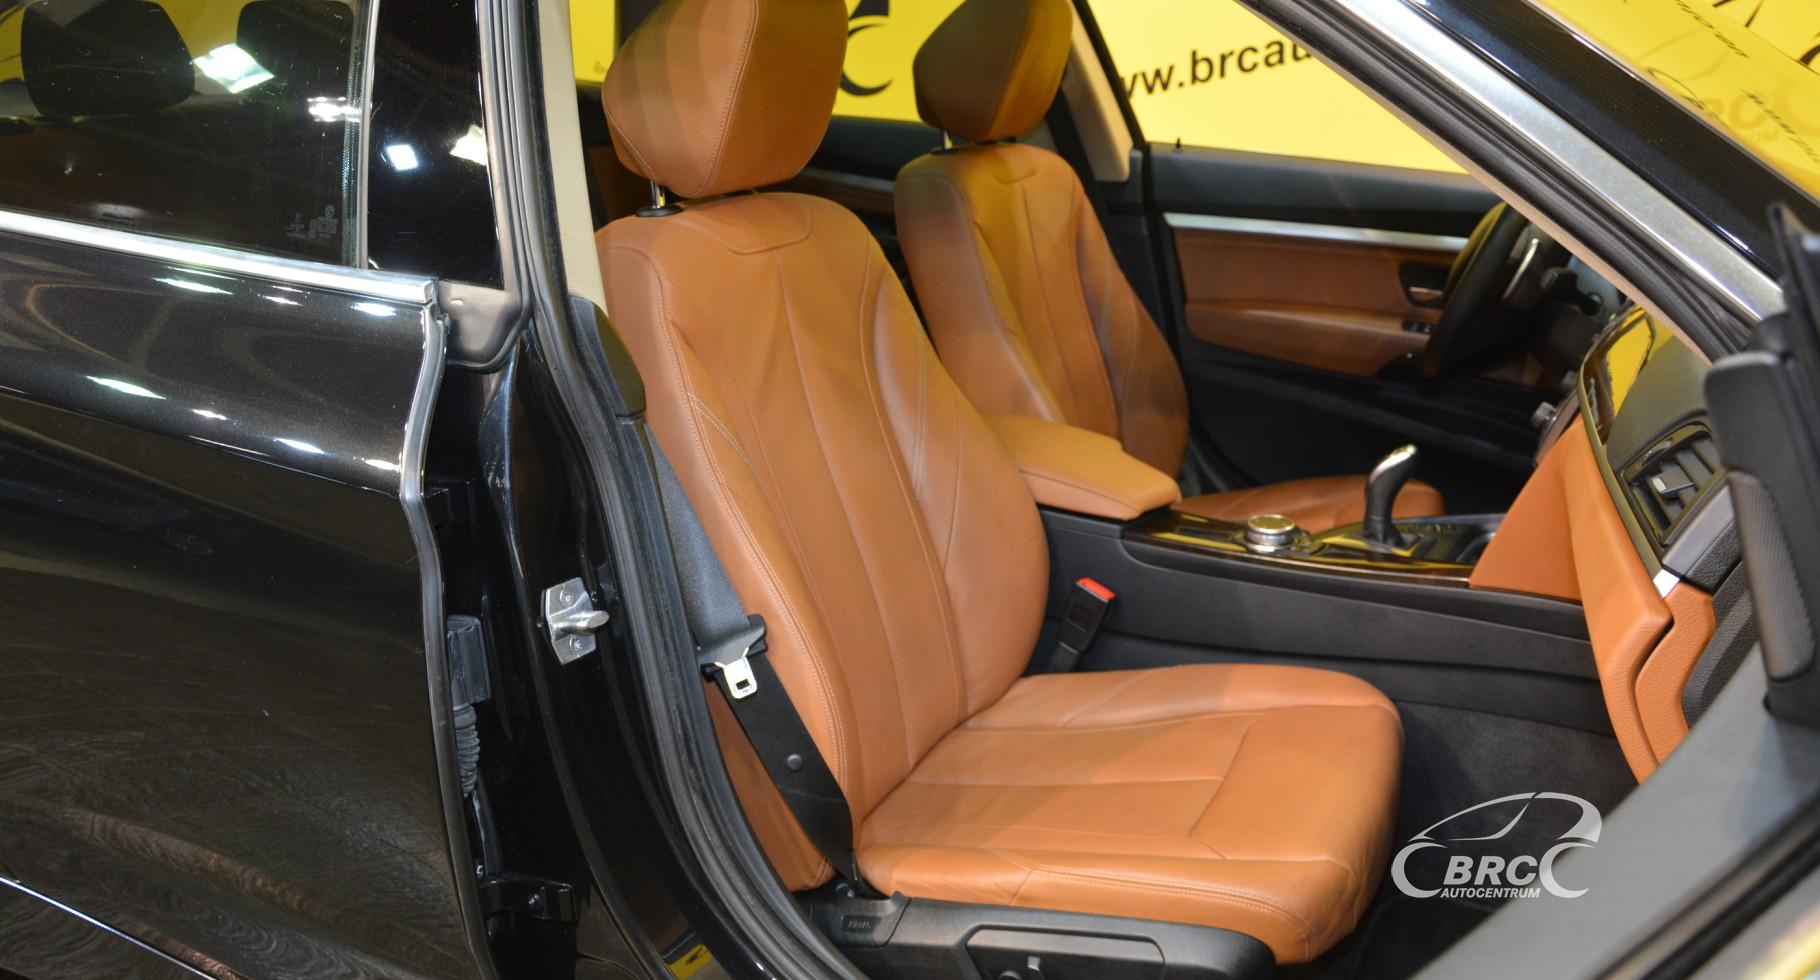 BMW 335 Gran Turismo xDrive Automatas